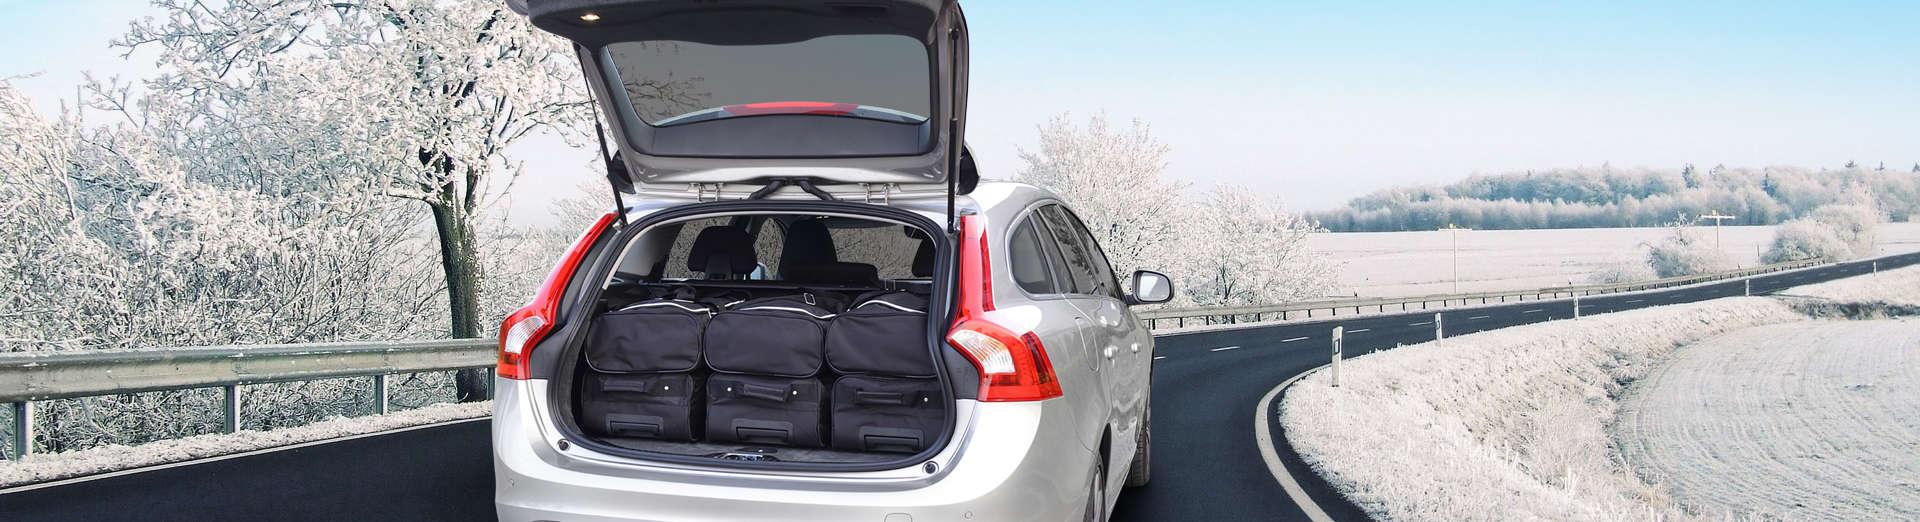 car-bags-concept-2